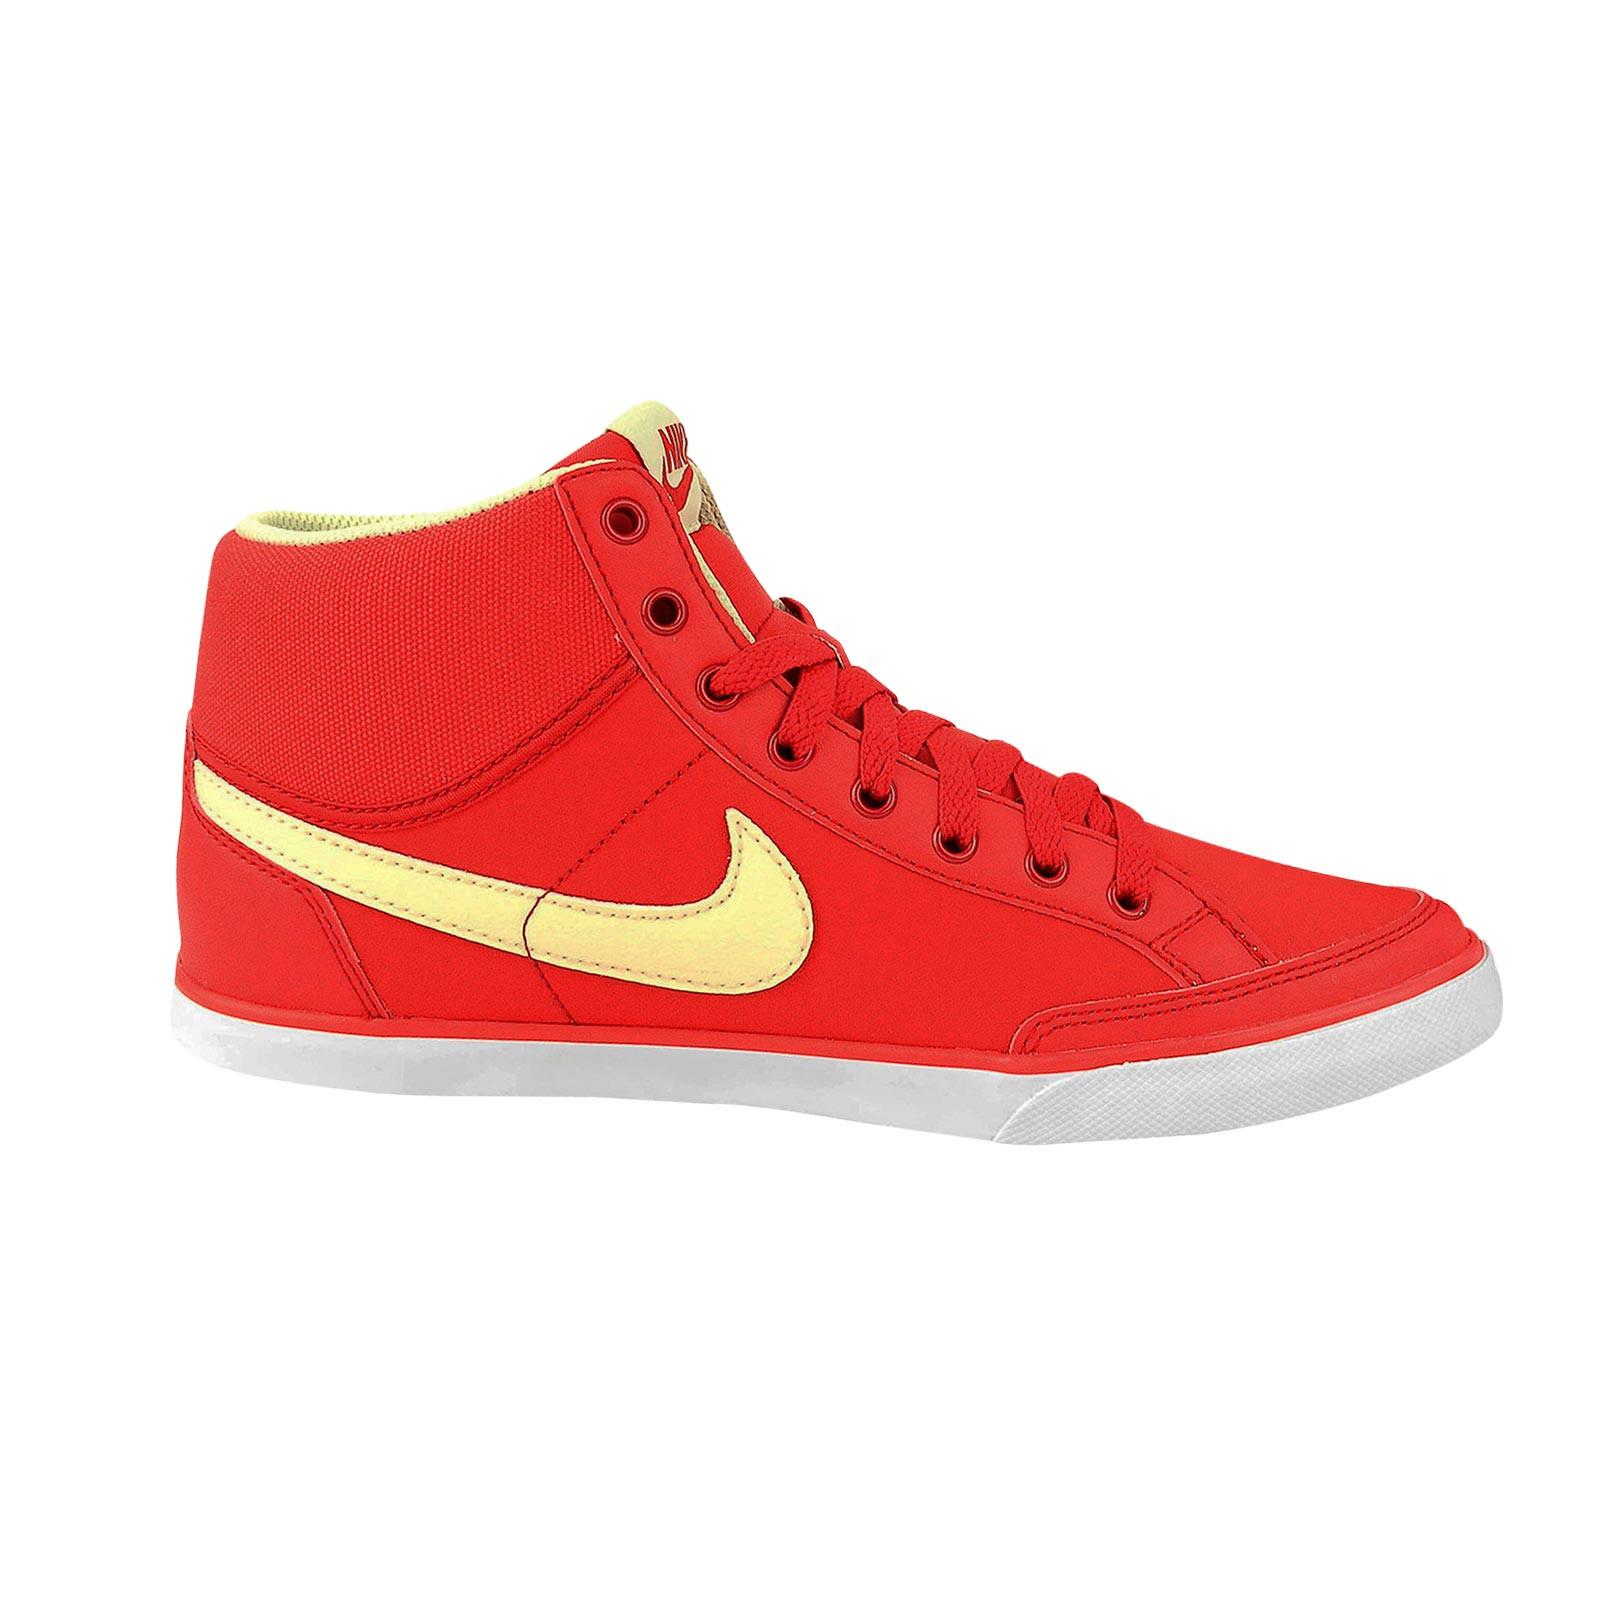 Limpiamente Magnético veneno  Zapatillas Nike Capri Iii Mid Ltr Sportswear para Hombre | Runa Store